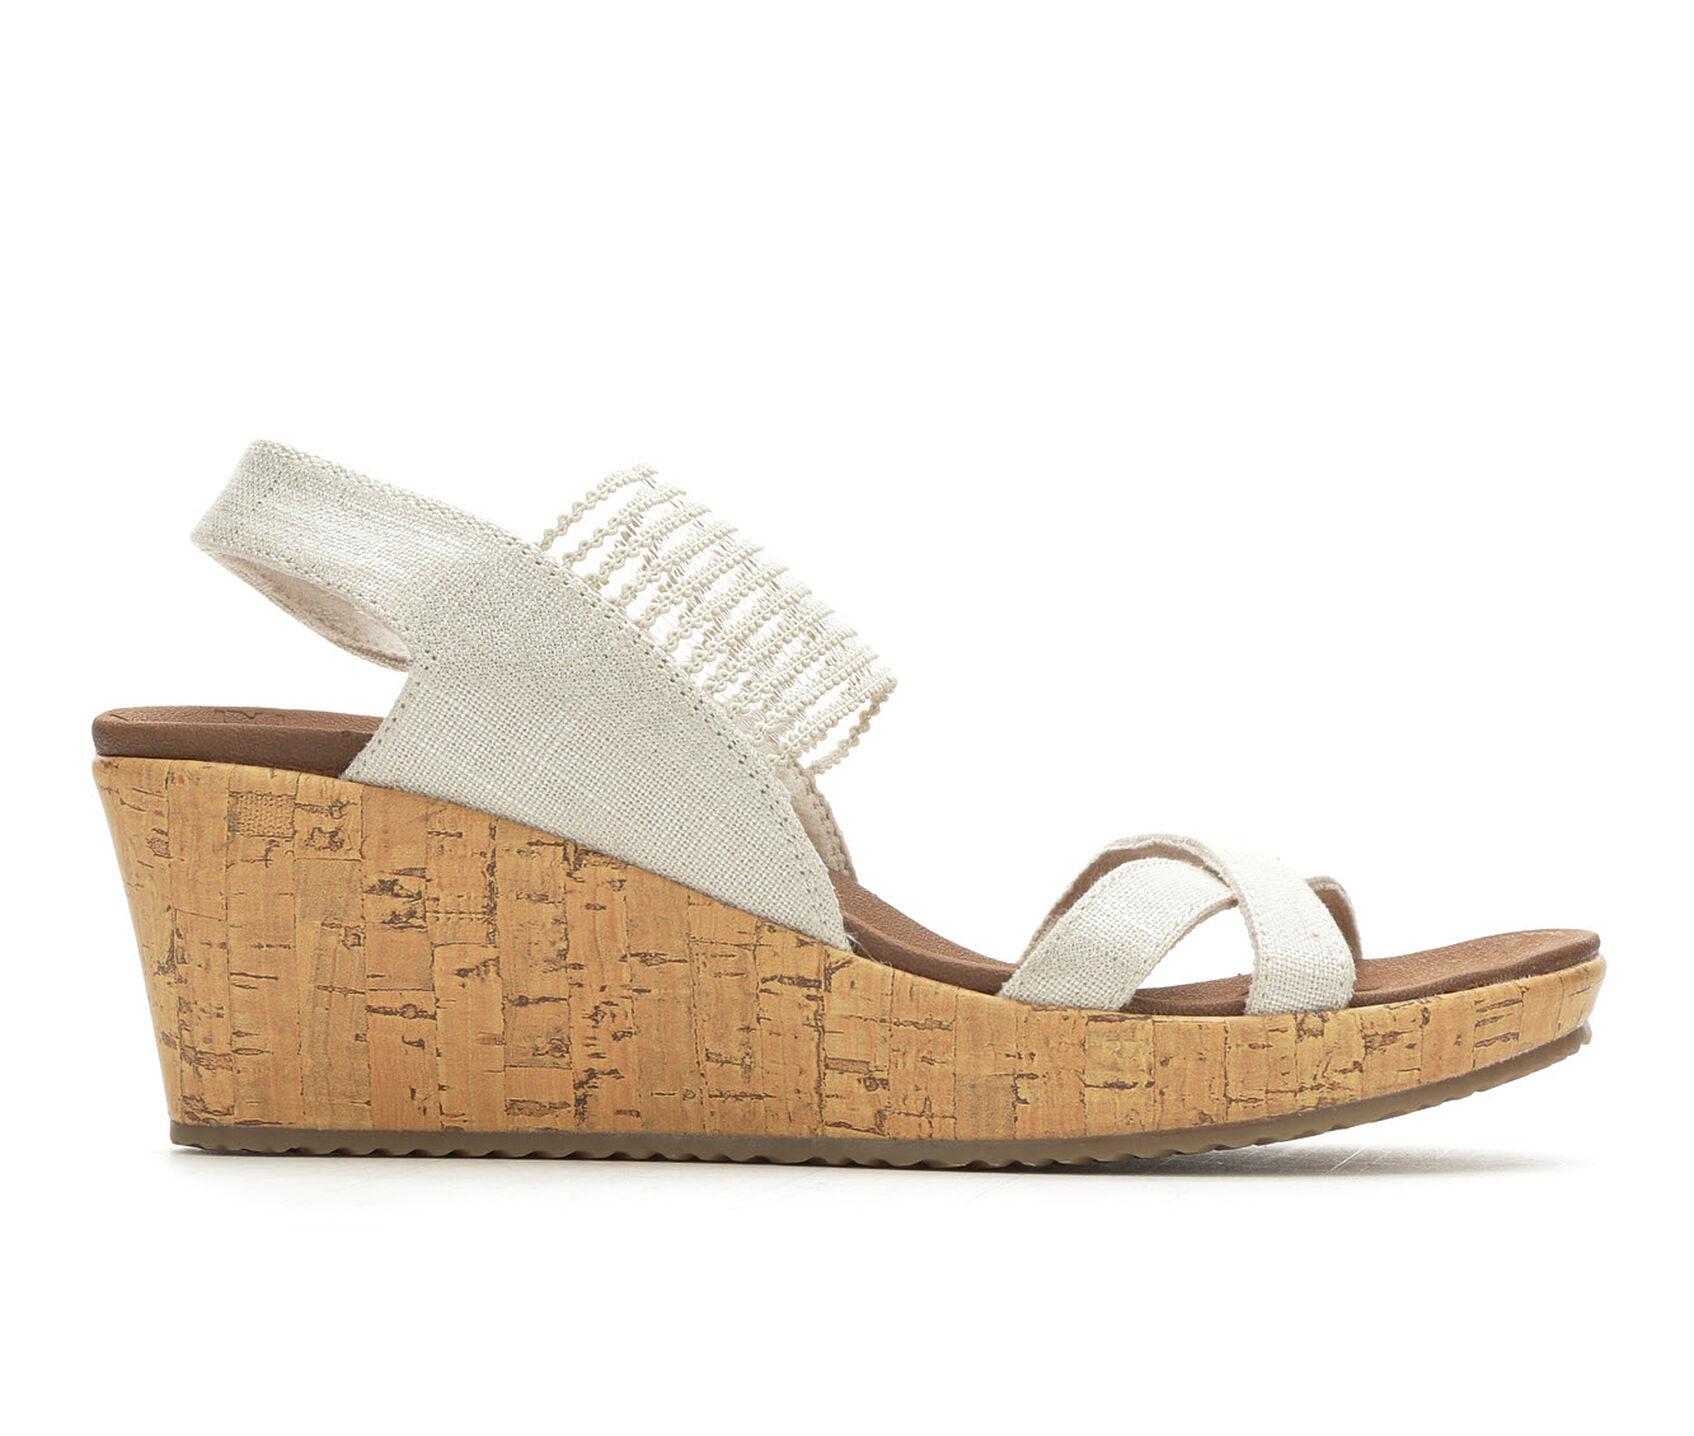 778069a8166c Women s Skechers Cali High Tea 31723 Strappy Wedge Sandals